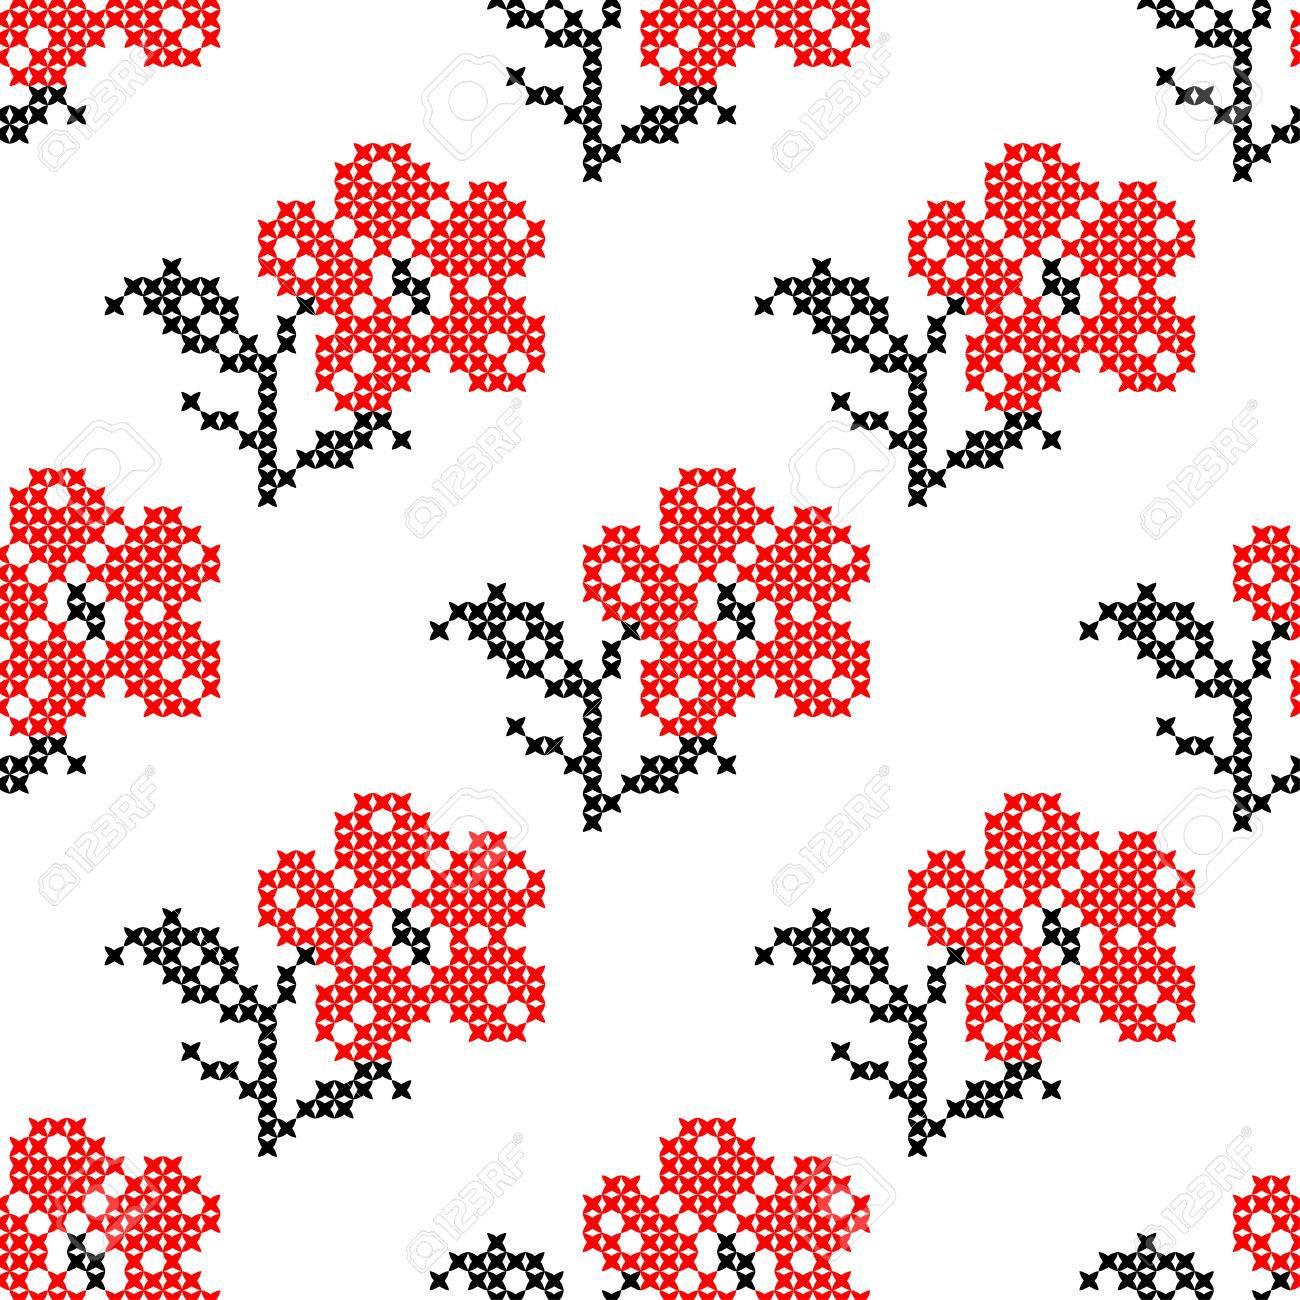 Textura Inconsútil Con Las Flores Aislado Bordados Rojos Abstractos ...